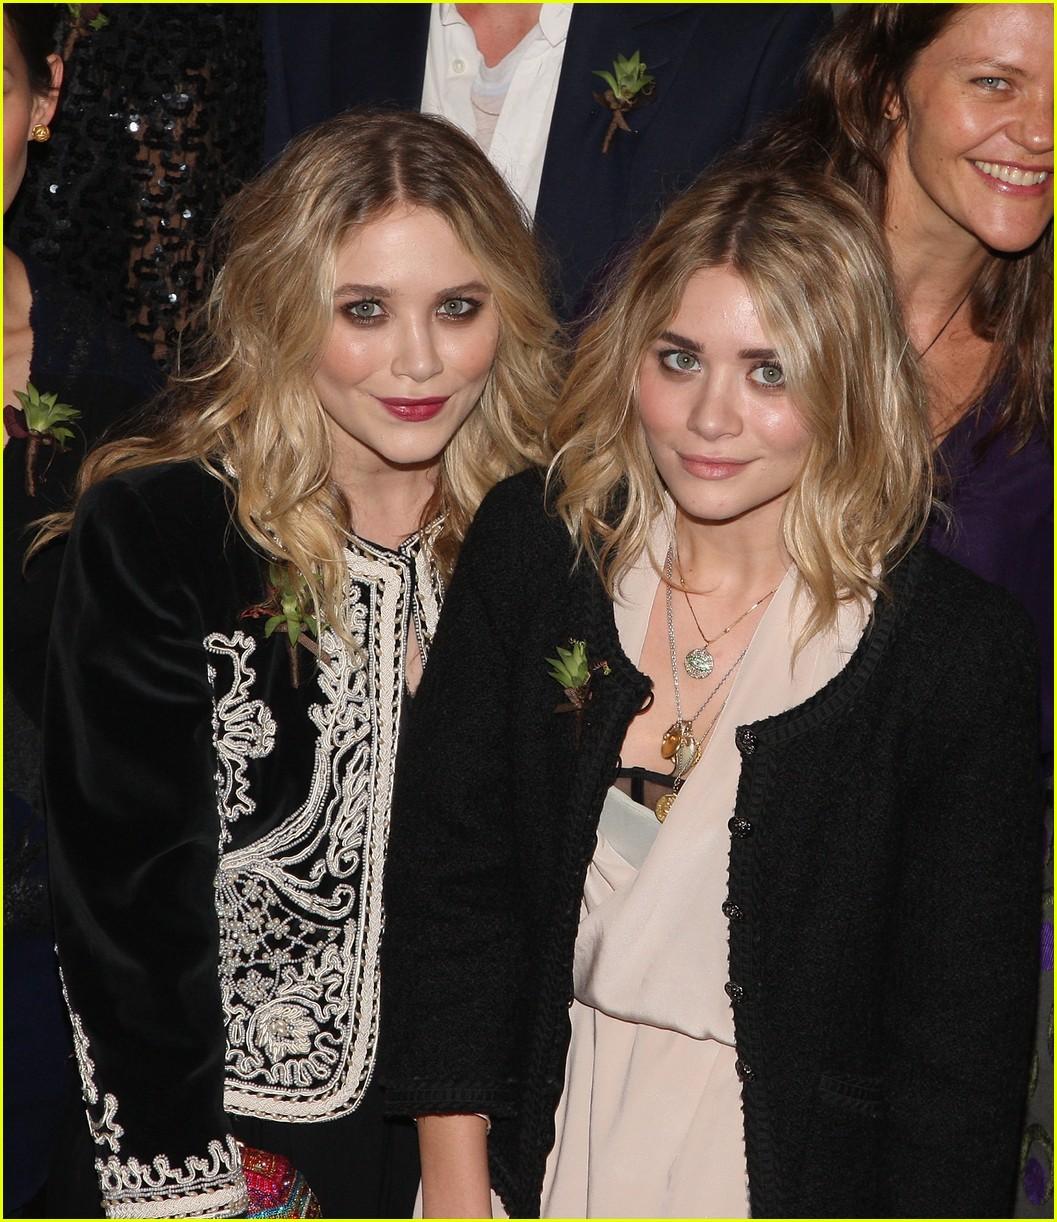 Mary Kate Amp Ashley Olsen The Future Of Fashion Photo